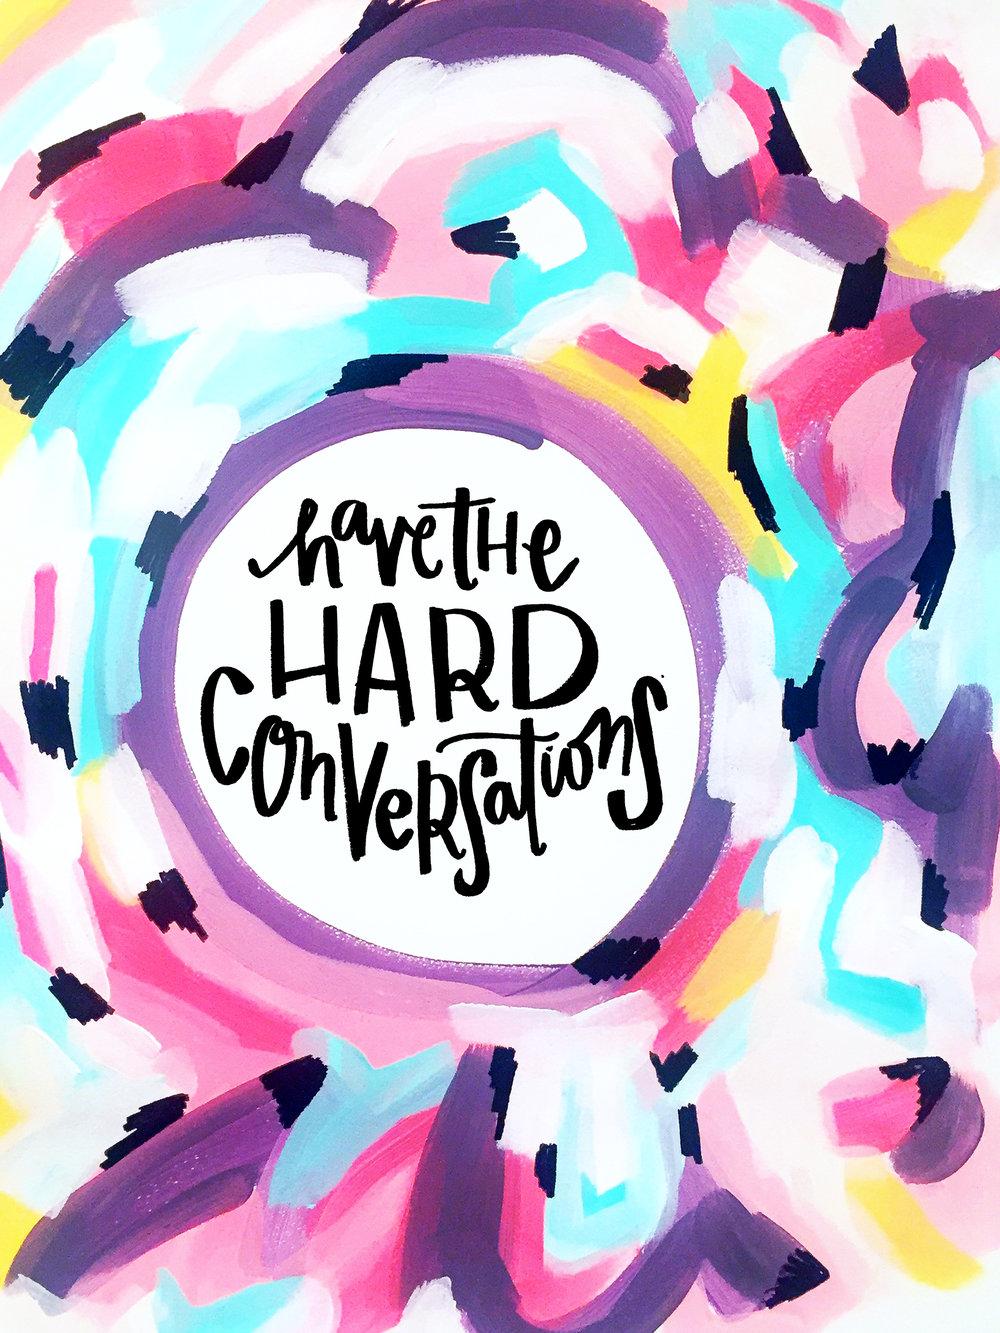 2/23/16: Conversations